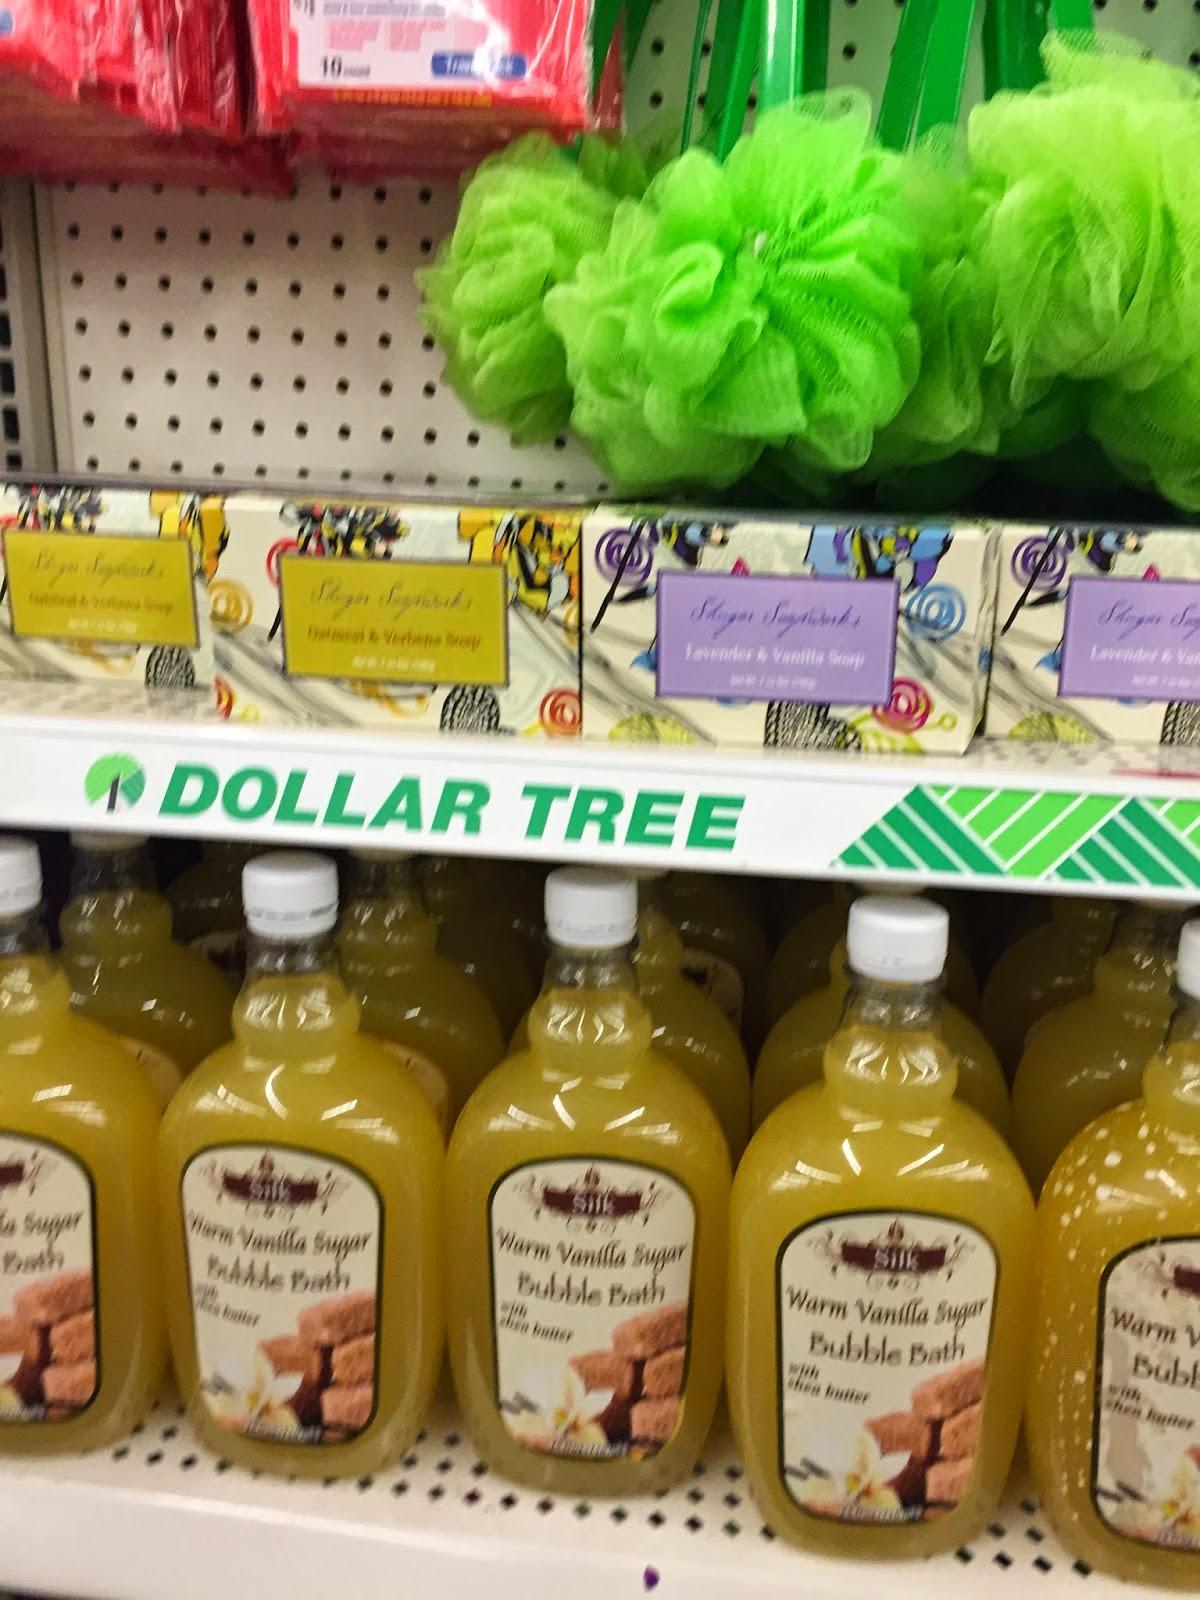 Dolla Holla Tree!: Dollar Tree Finds 11.6.14 & Mid-November